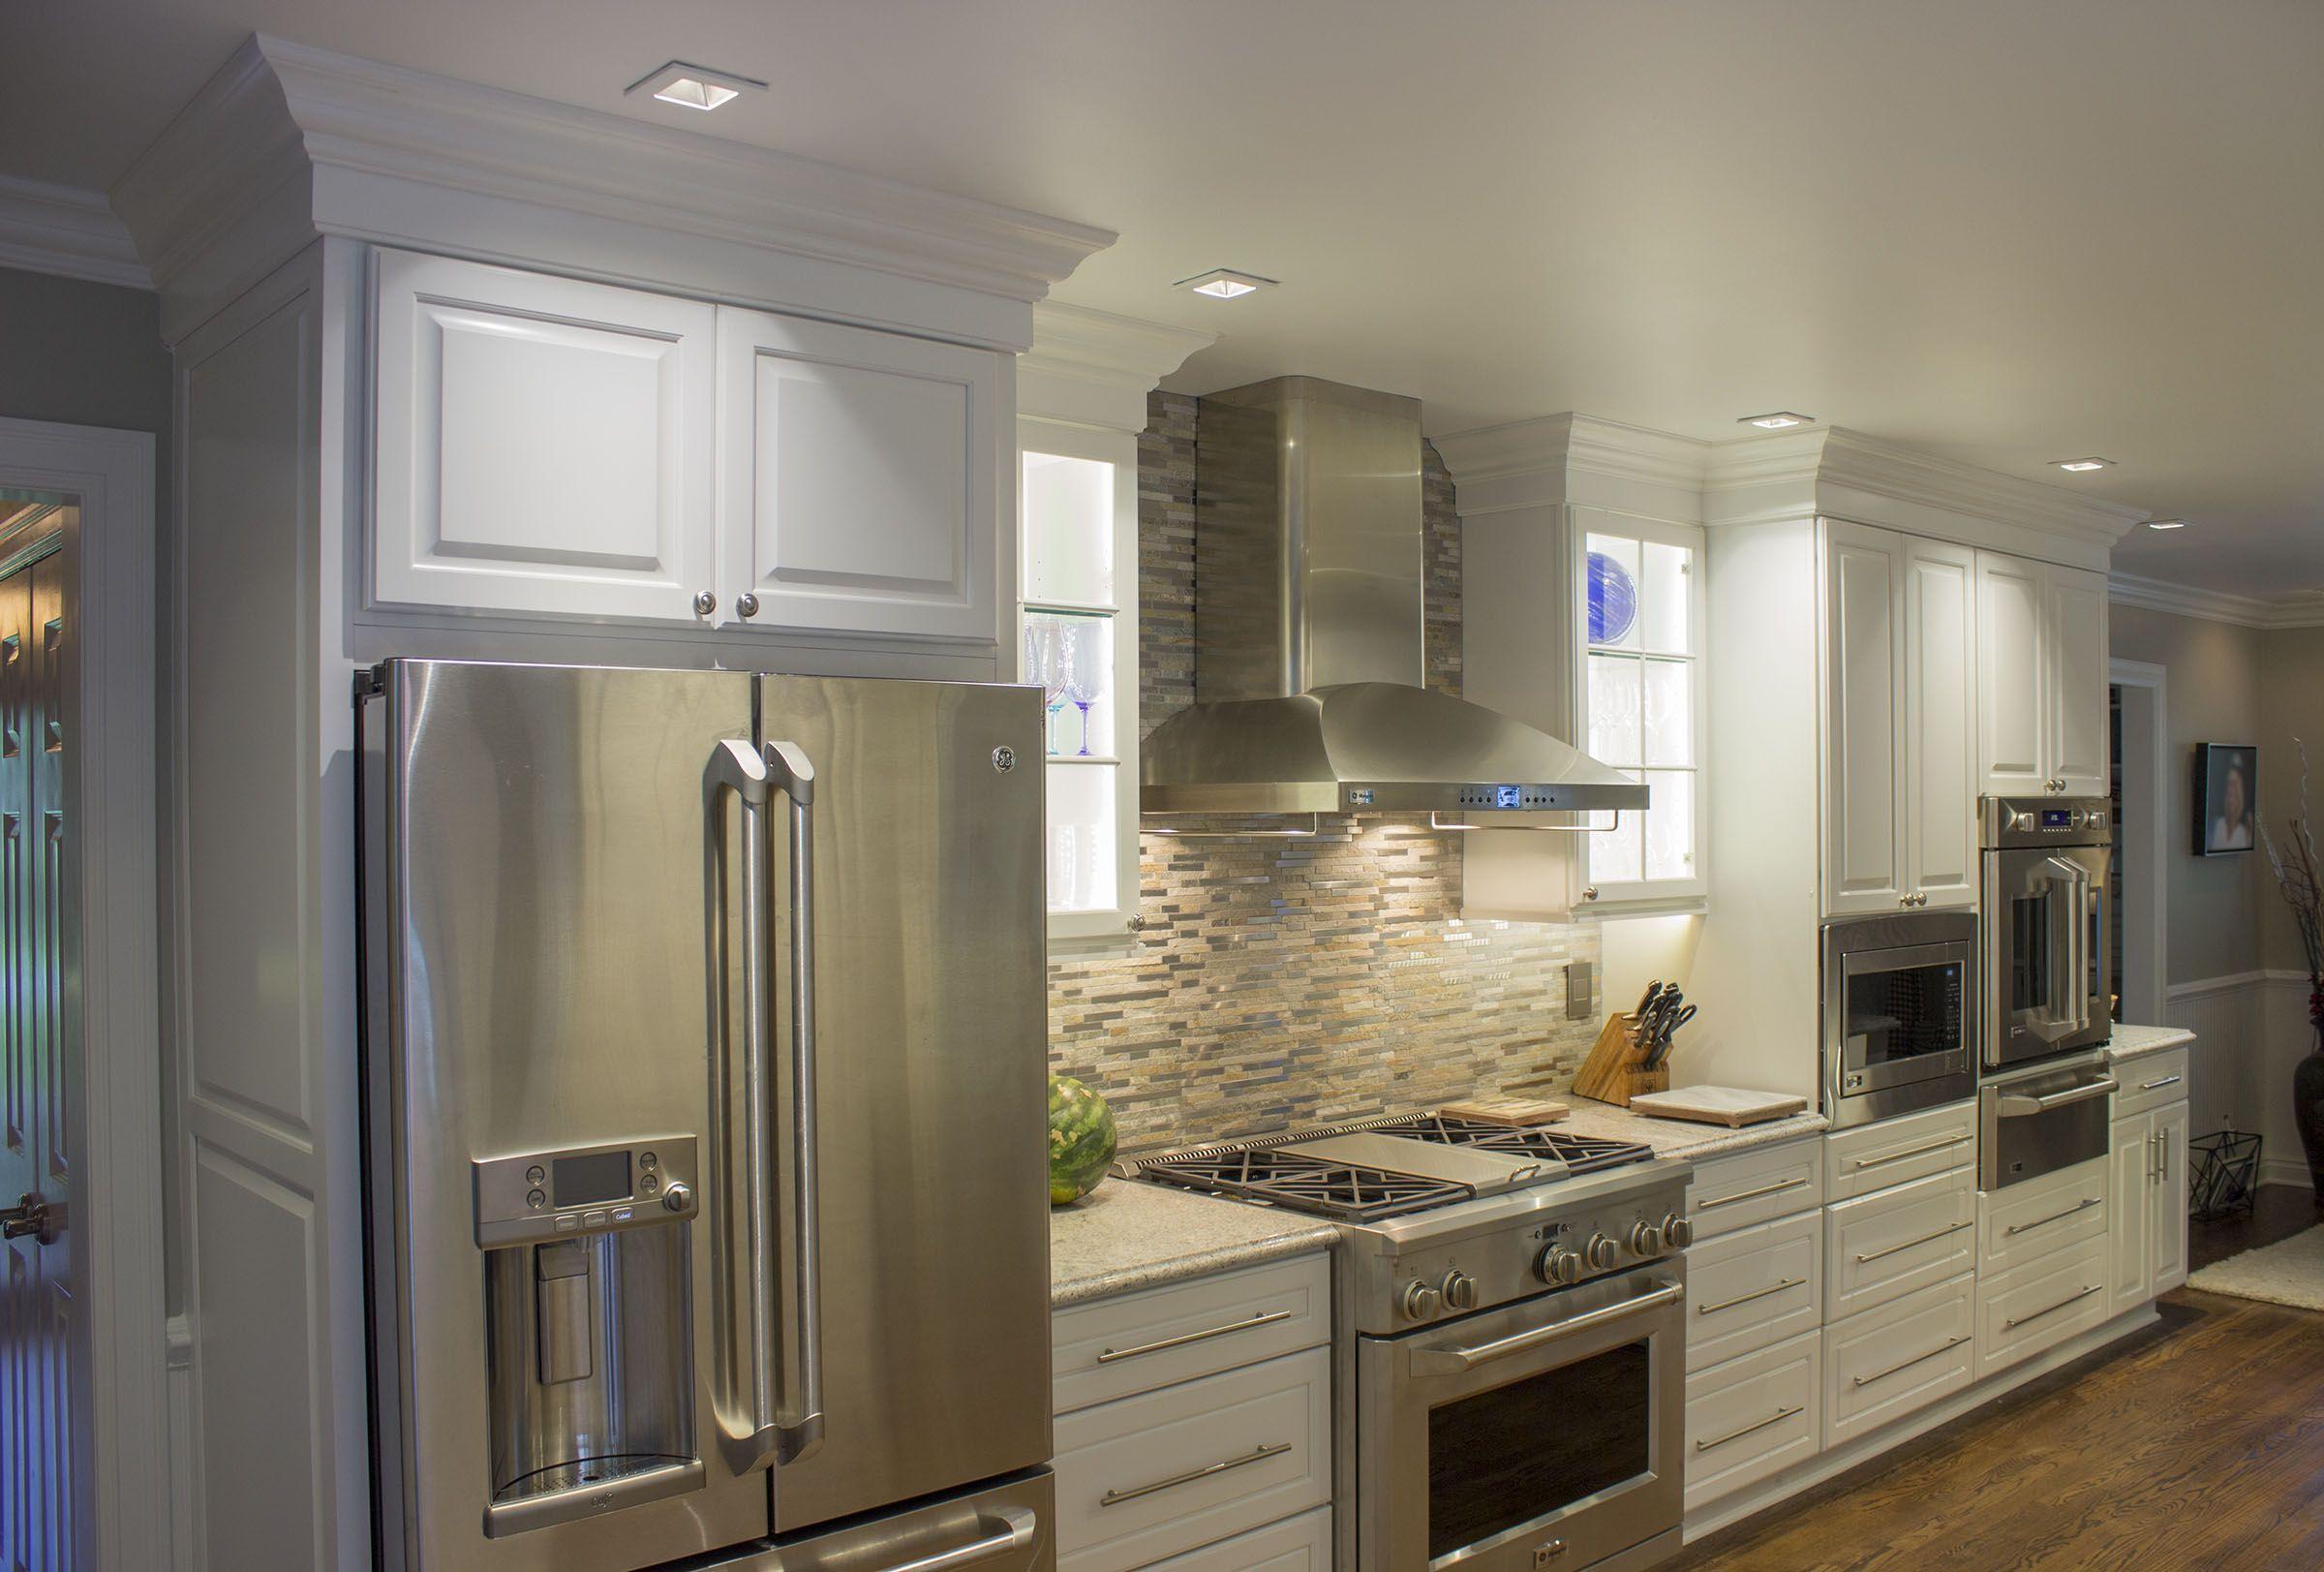 Photo Courtesy Of Dave Mccoll Ksi Designer Dura Supreme Crestwood Arcadia Classic Maple With White Paint Finish Kitchen Kitchen Cabinets Home Decor